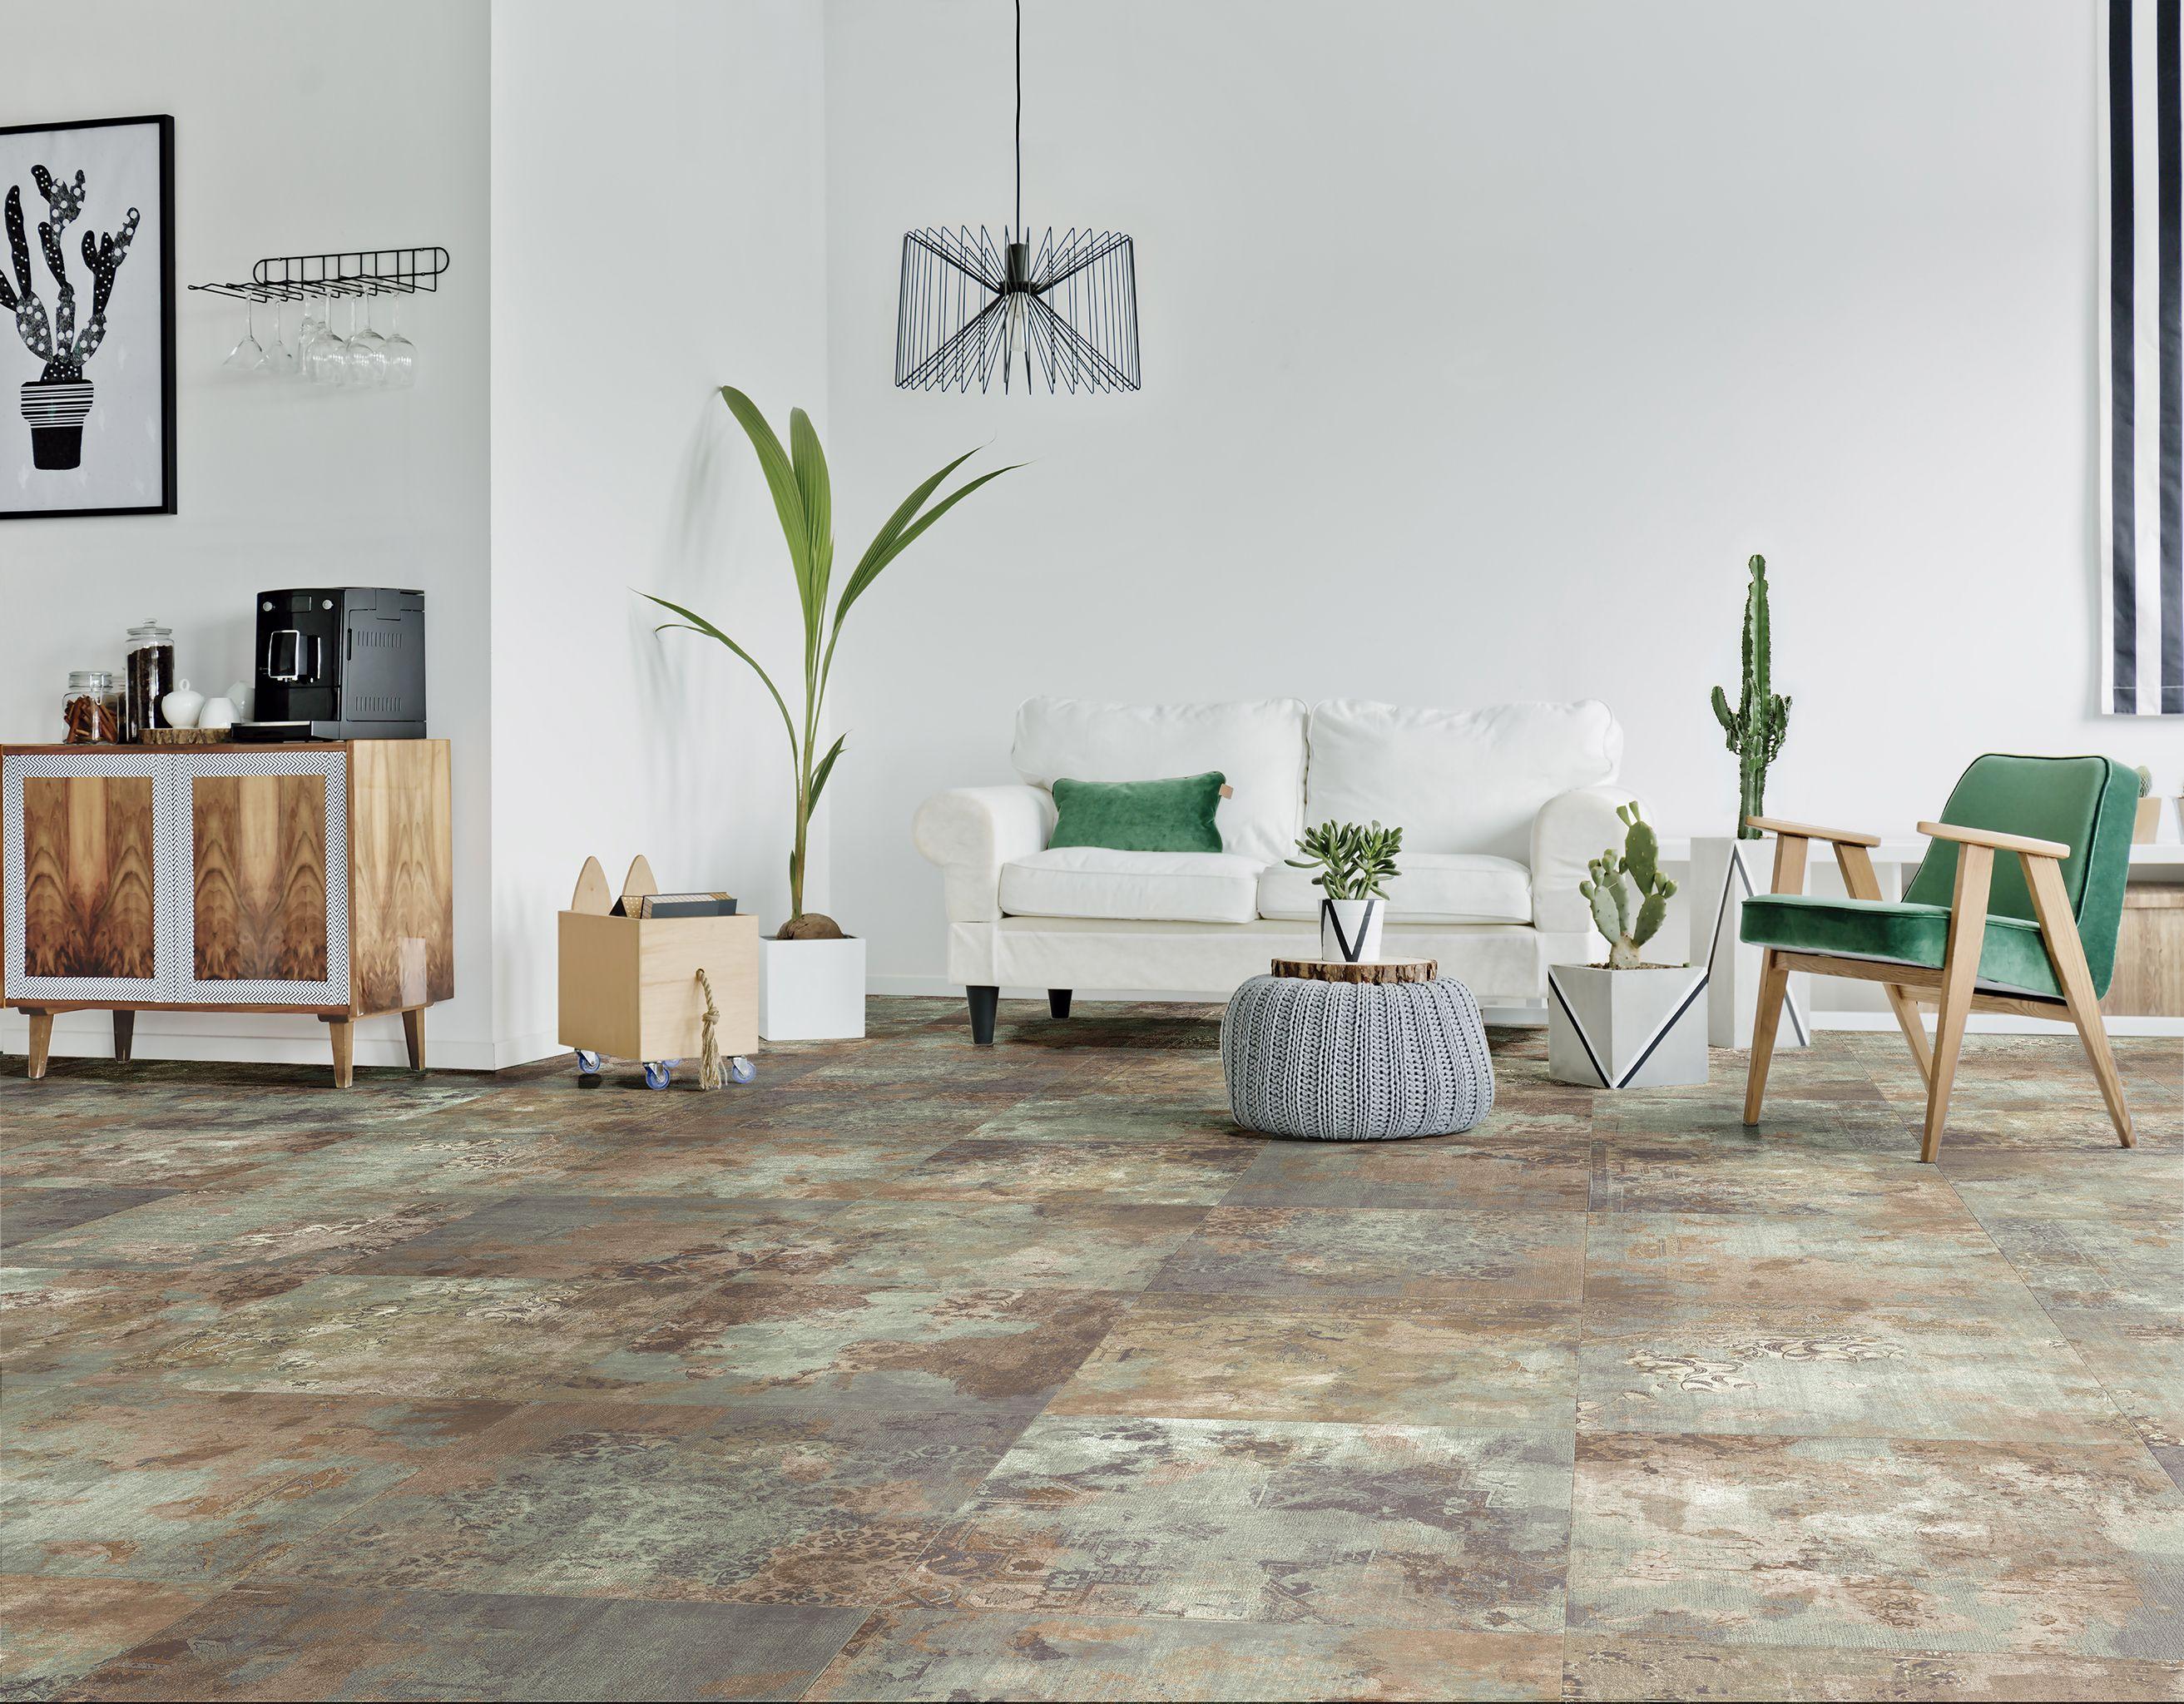 Habitat Ceramics Bagdad Verde Gris Y Beige 60cm X 60cm Southwestern Area Rugs Vinyl Flooring Trending Decor